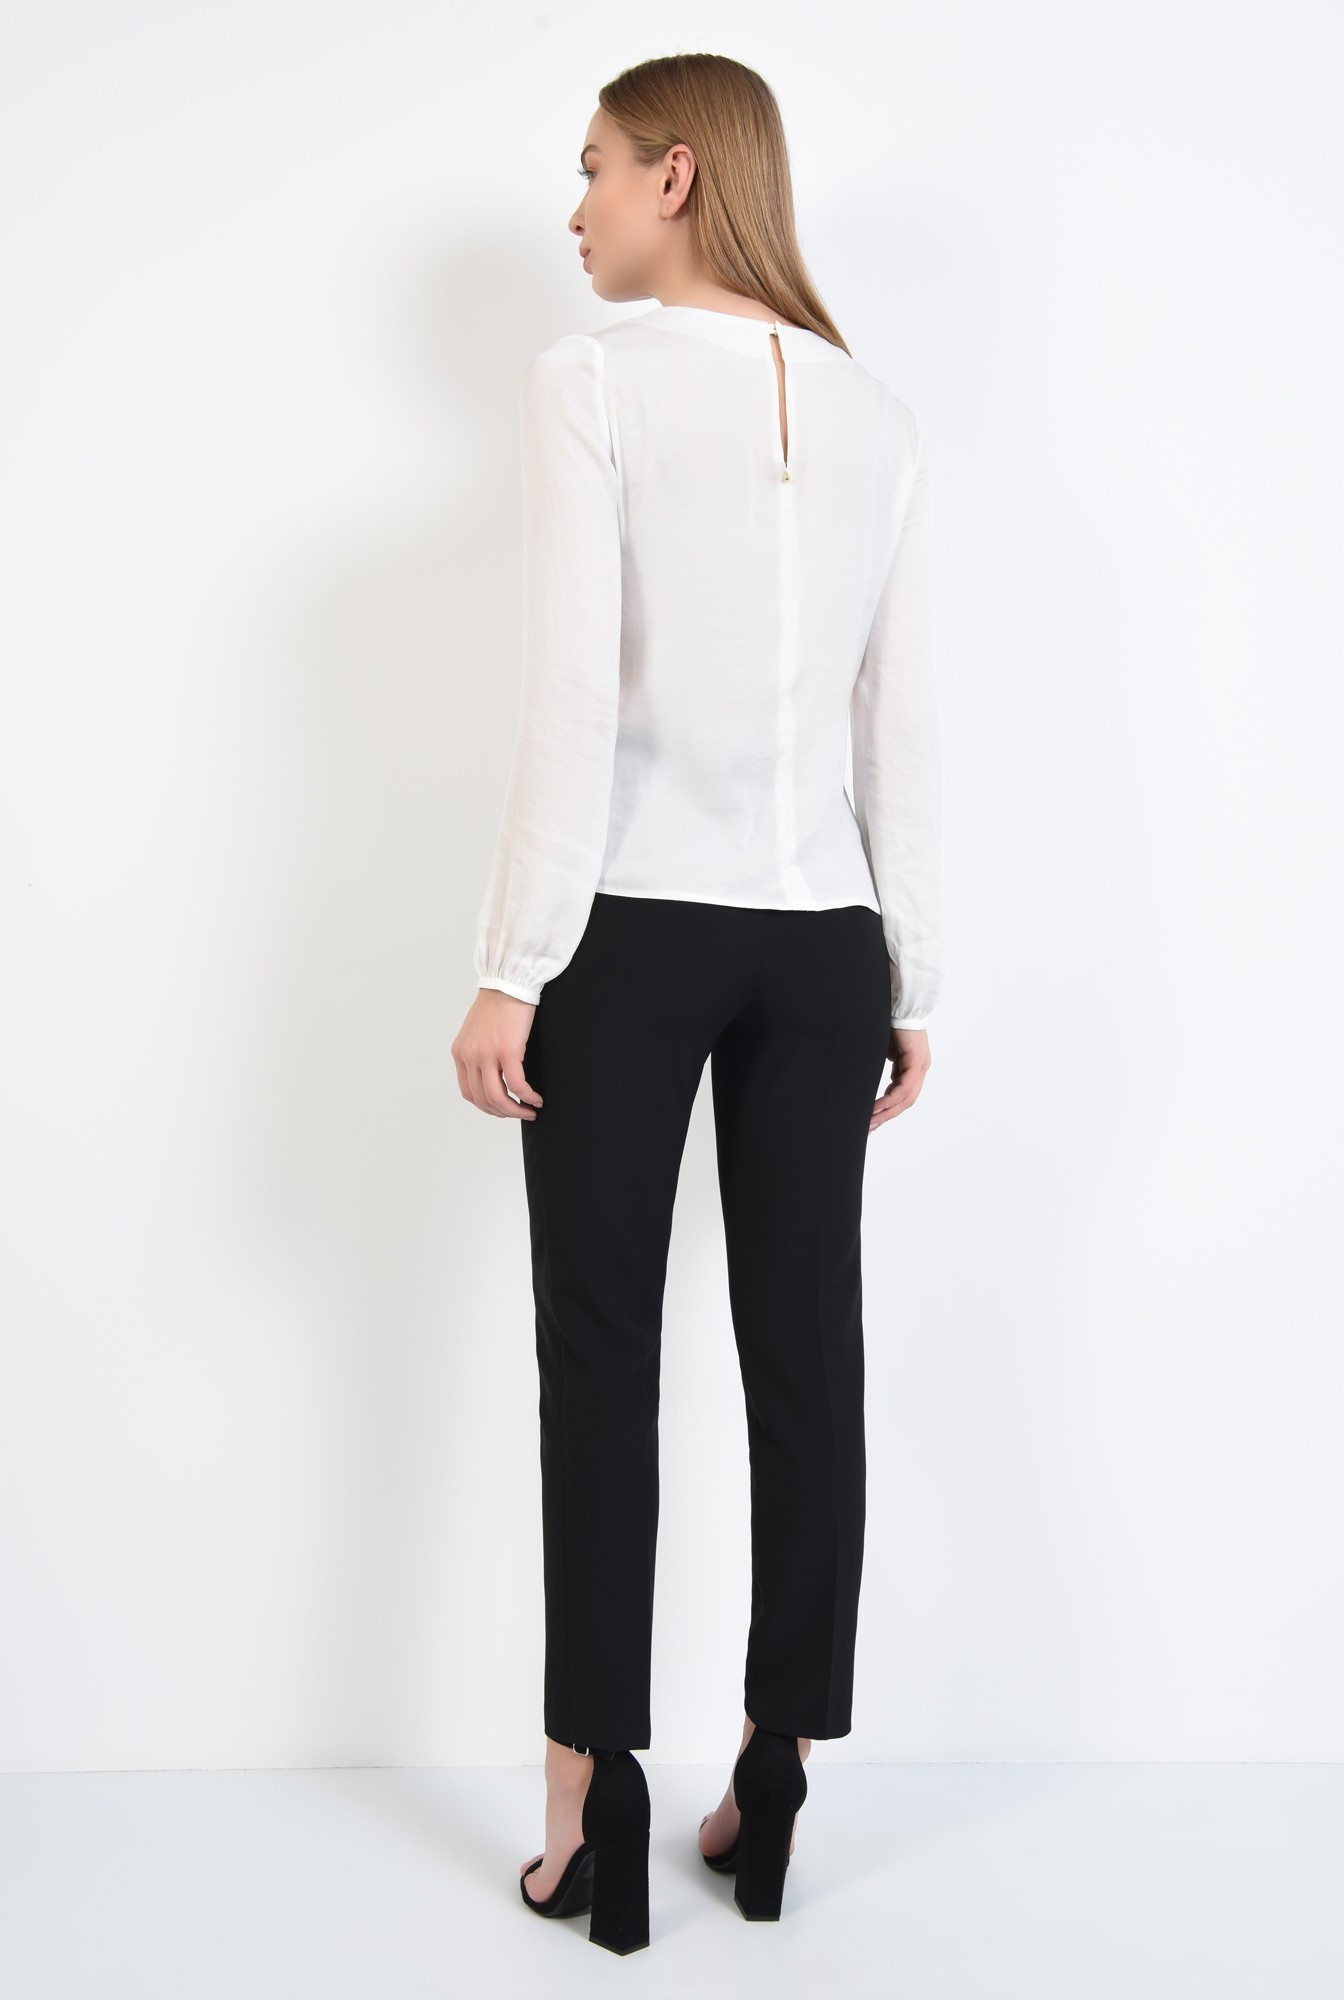 1 - 360 - bluza cu rips, casual, croi lejer, maneci lungi